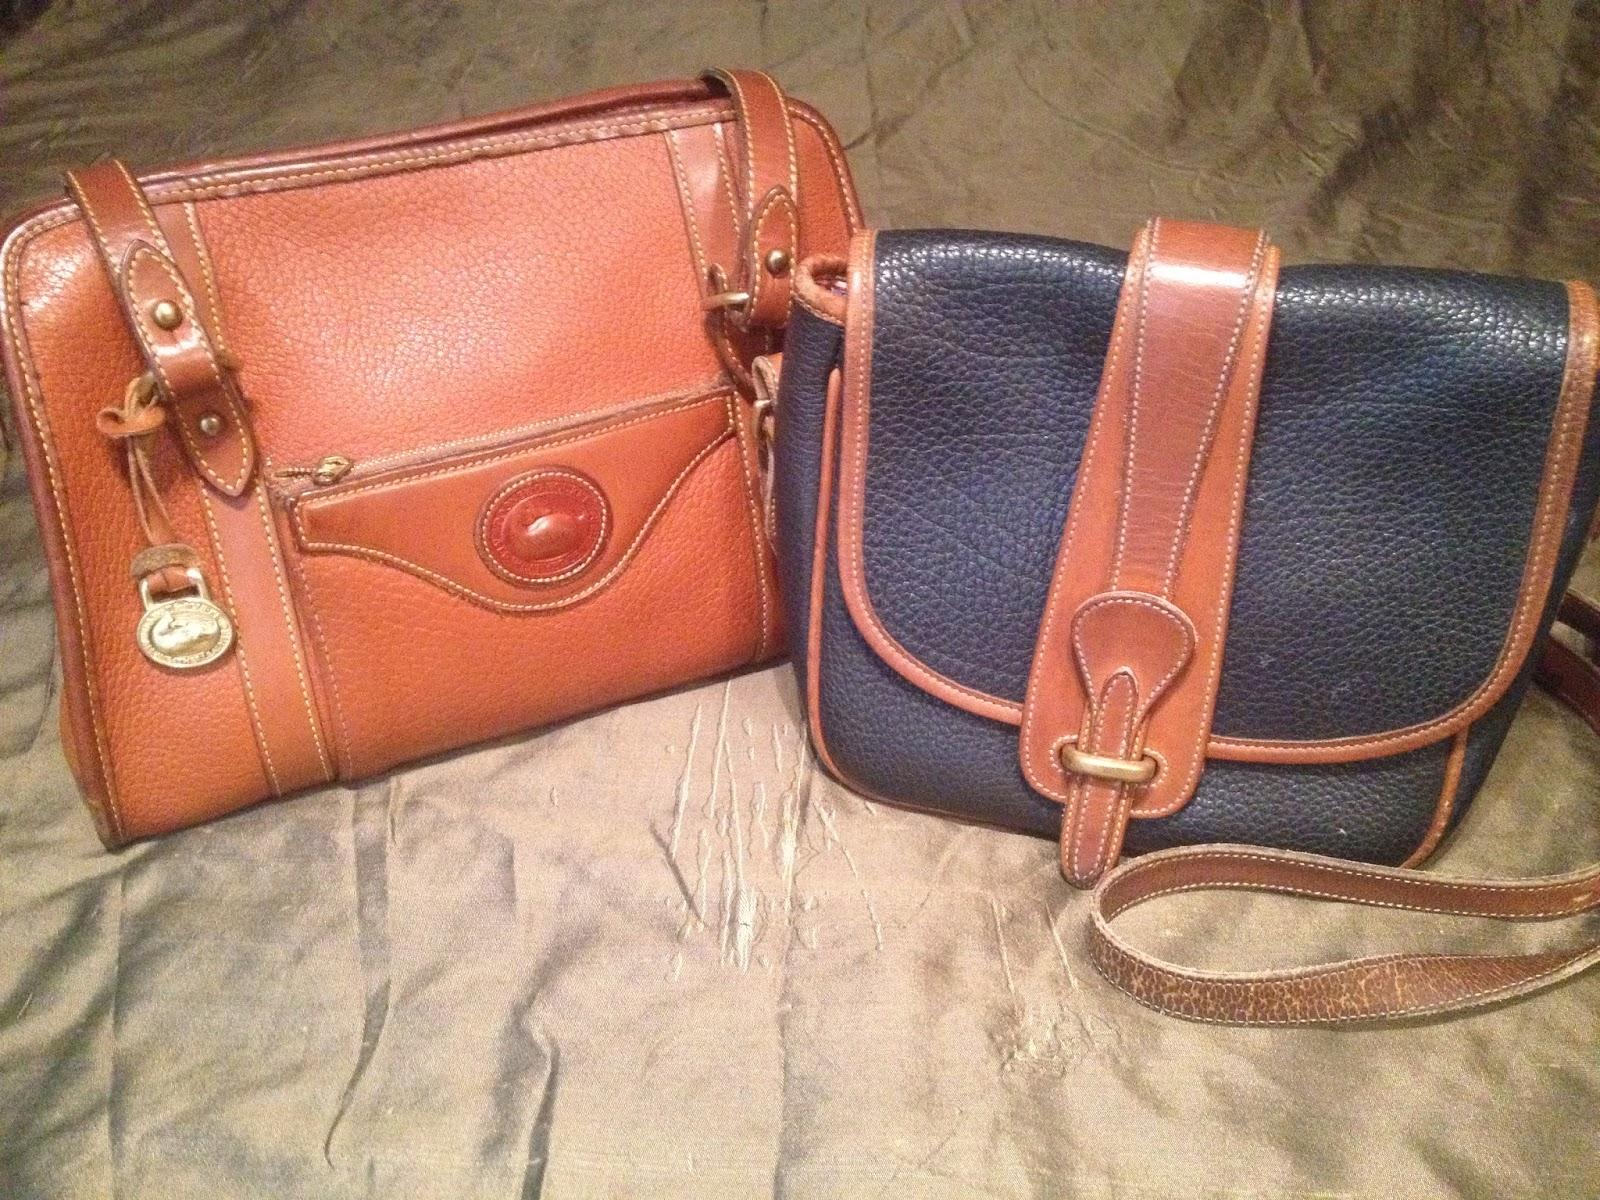 Blog About Bags  Authenticate Designer Handbags 1fb8c28359bf0